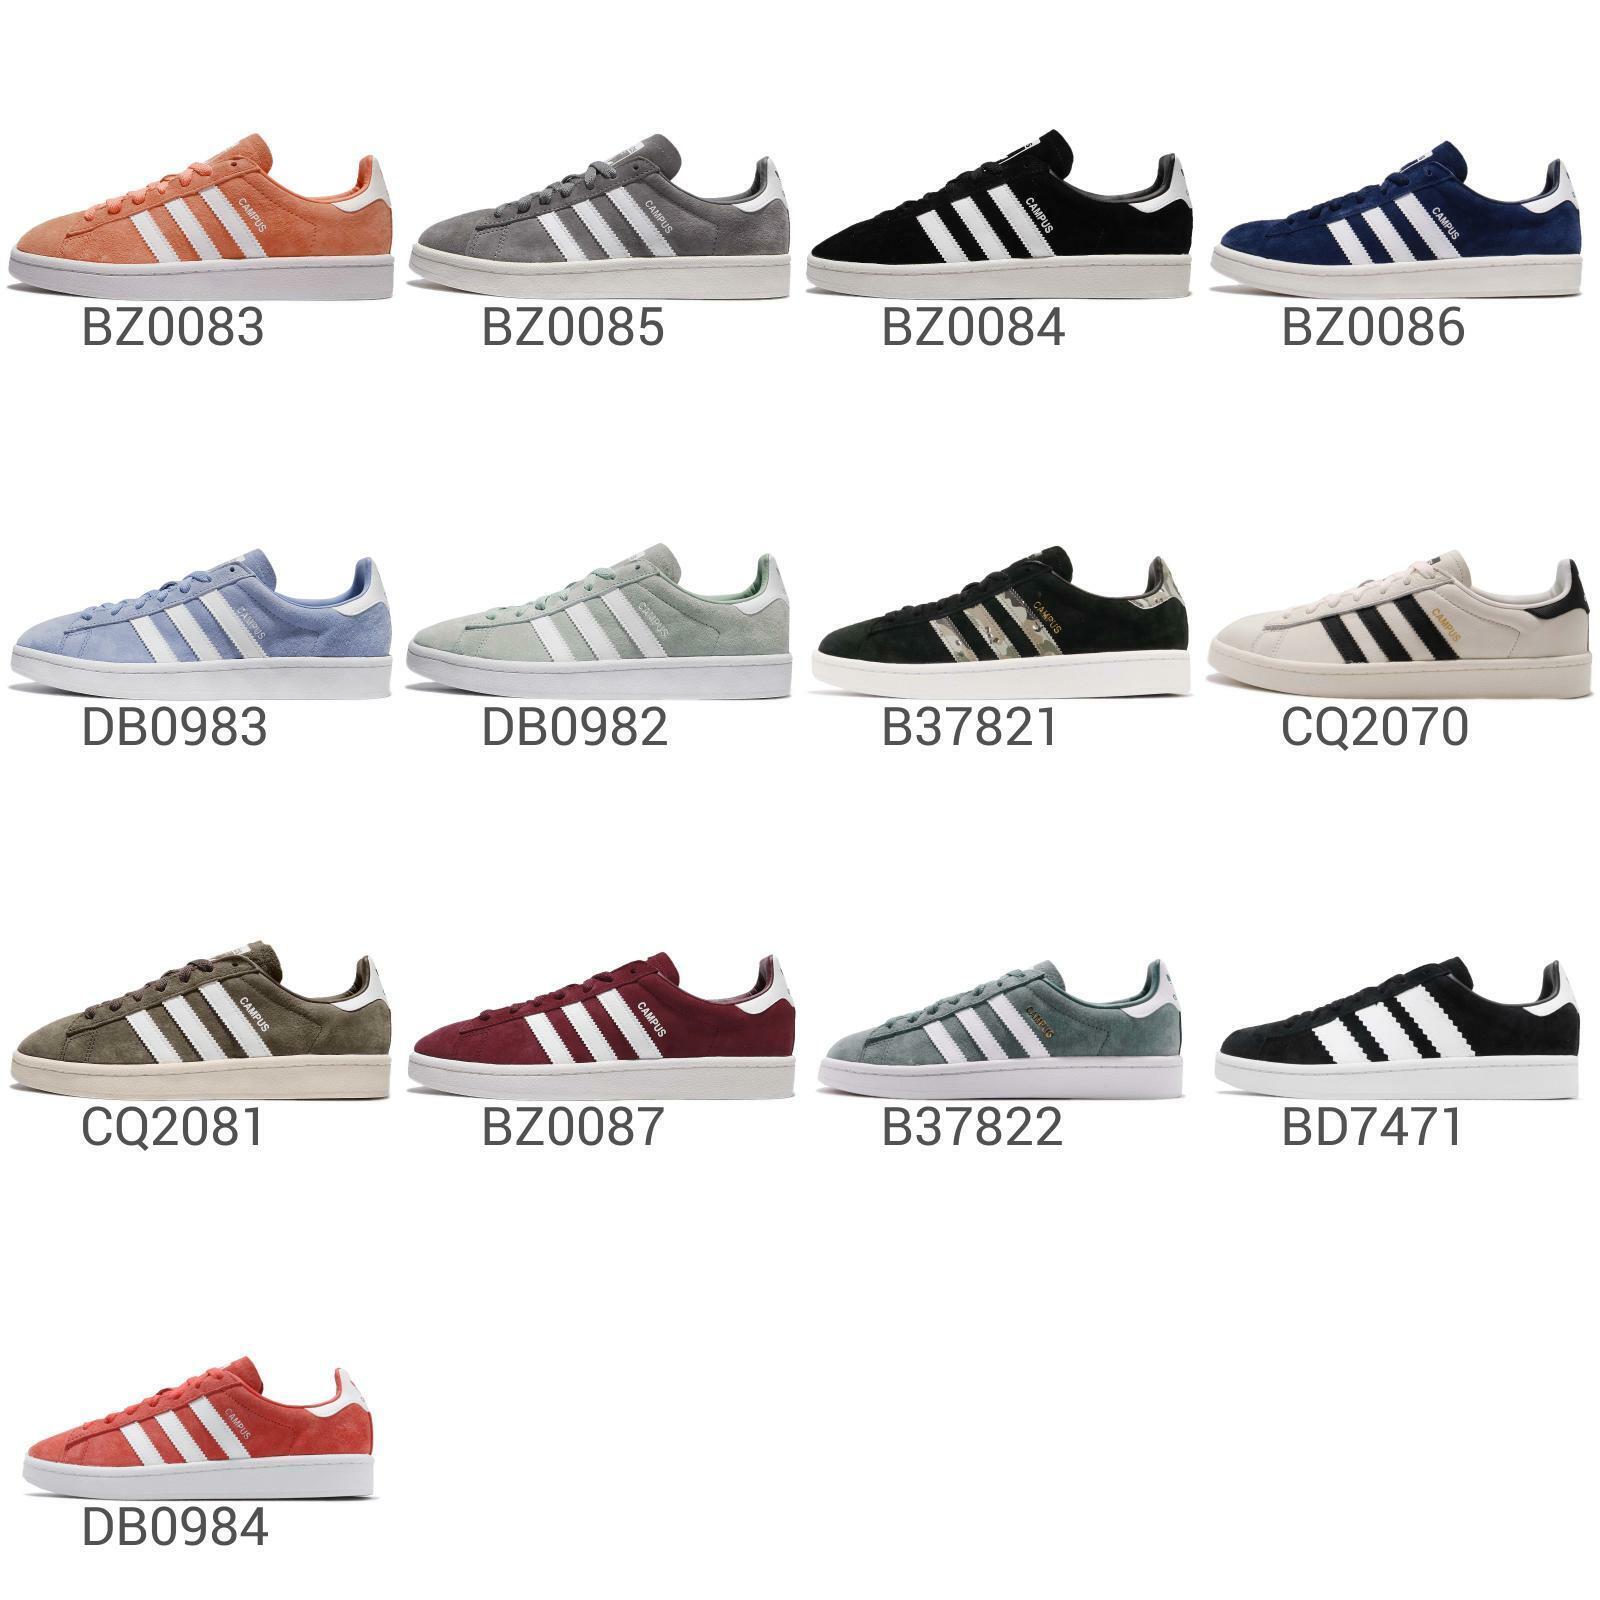 Adidas Originals Campus Mens   Womens Casual shoes Classic Retro Sneakers Pick 1